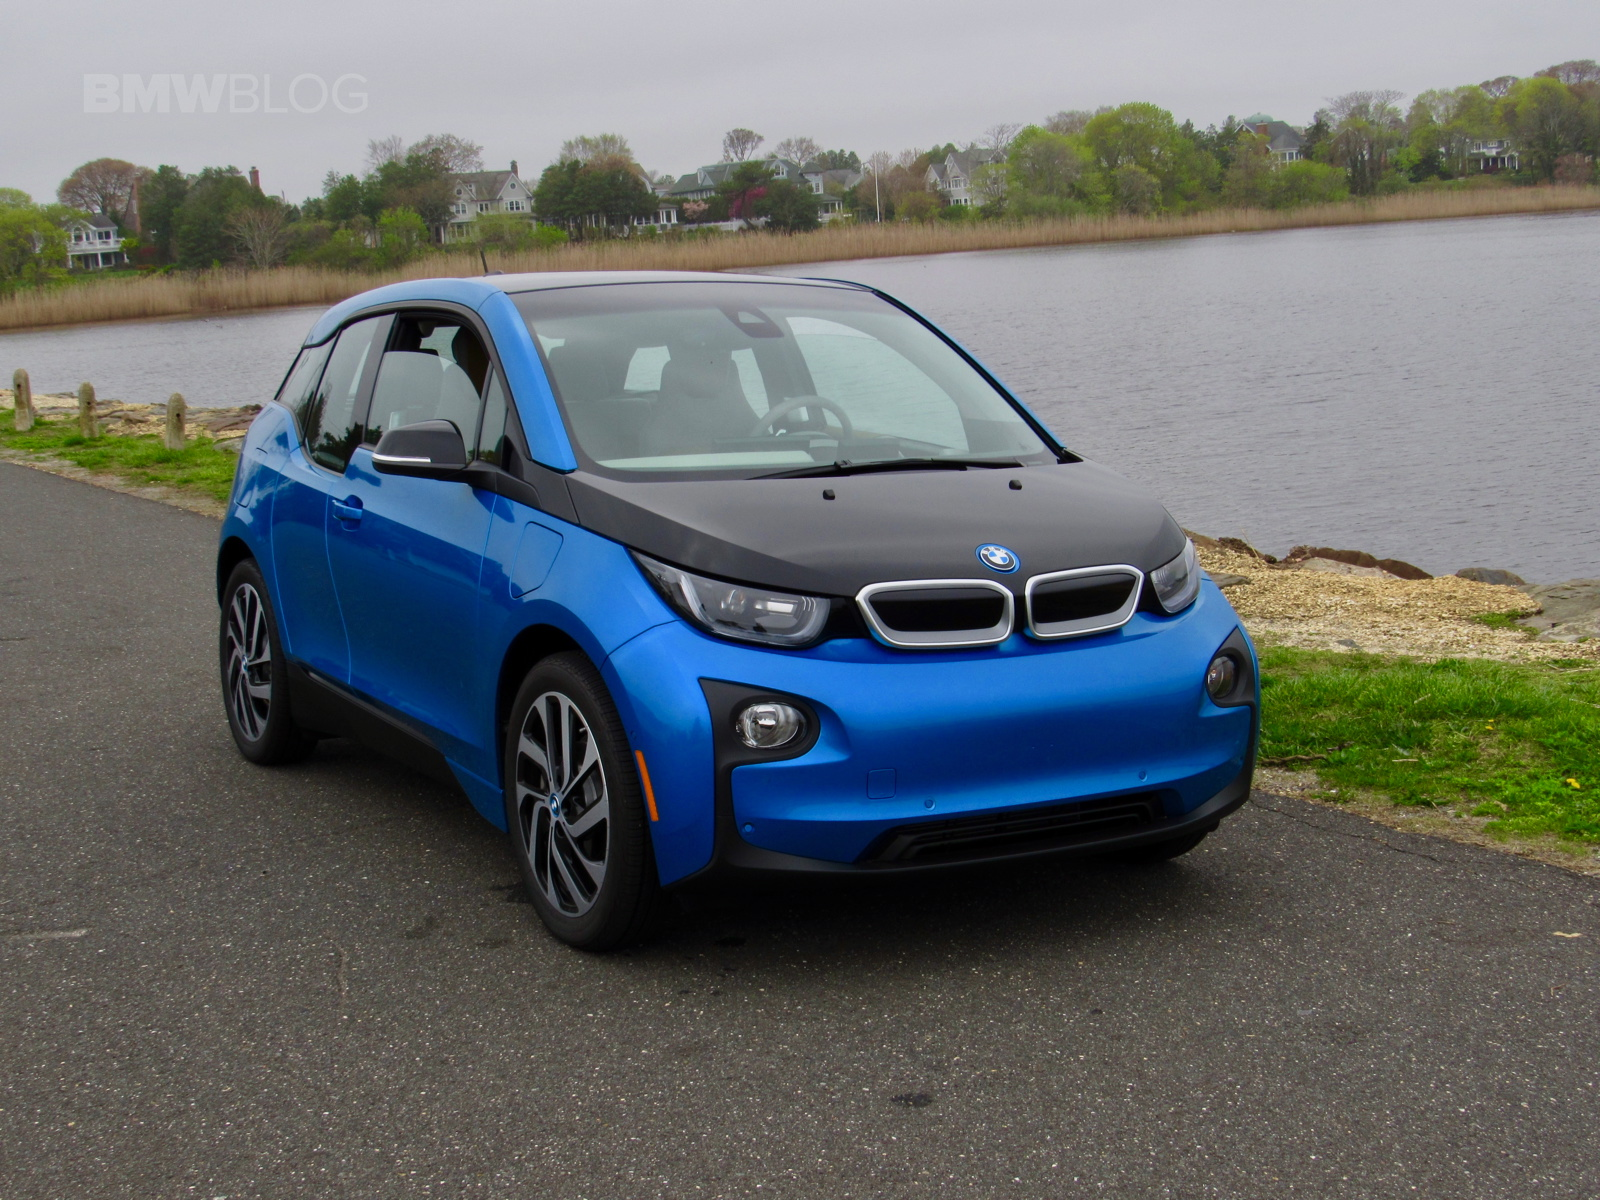 2017 BMW i3 test drive 15